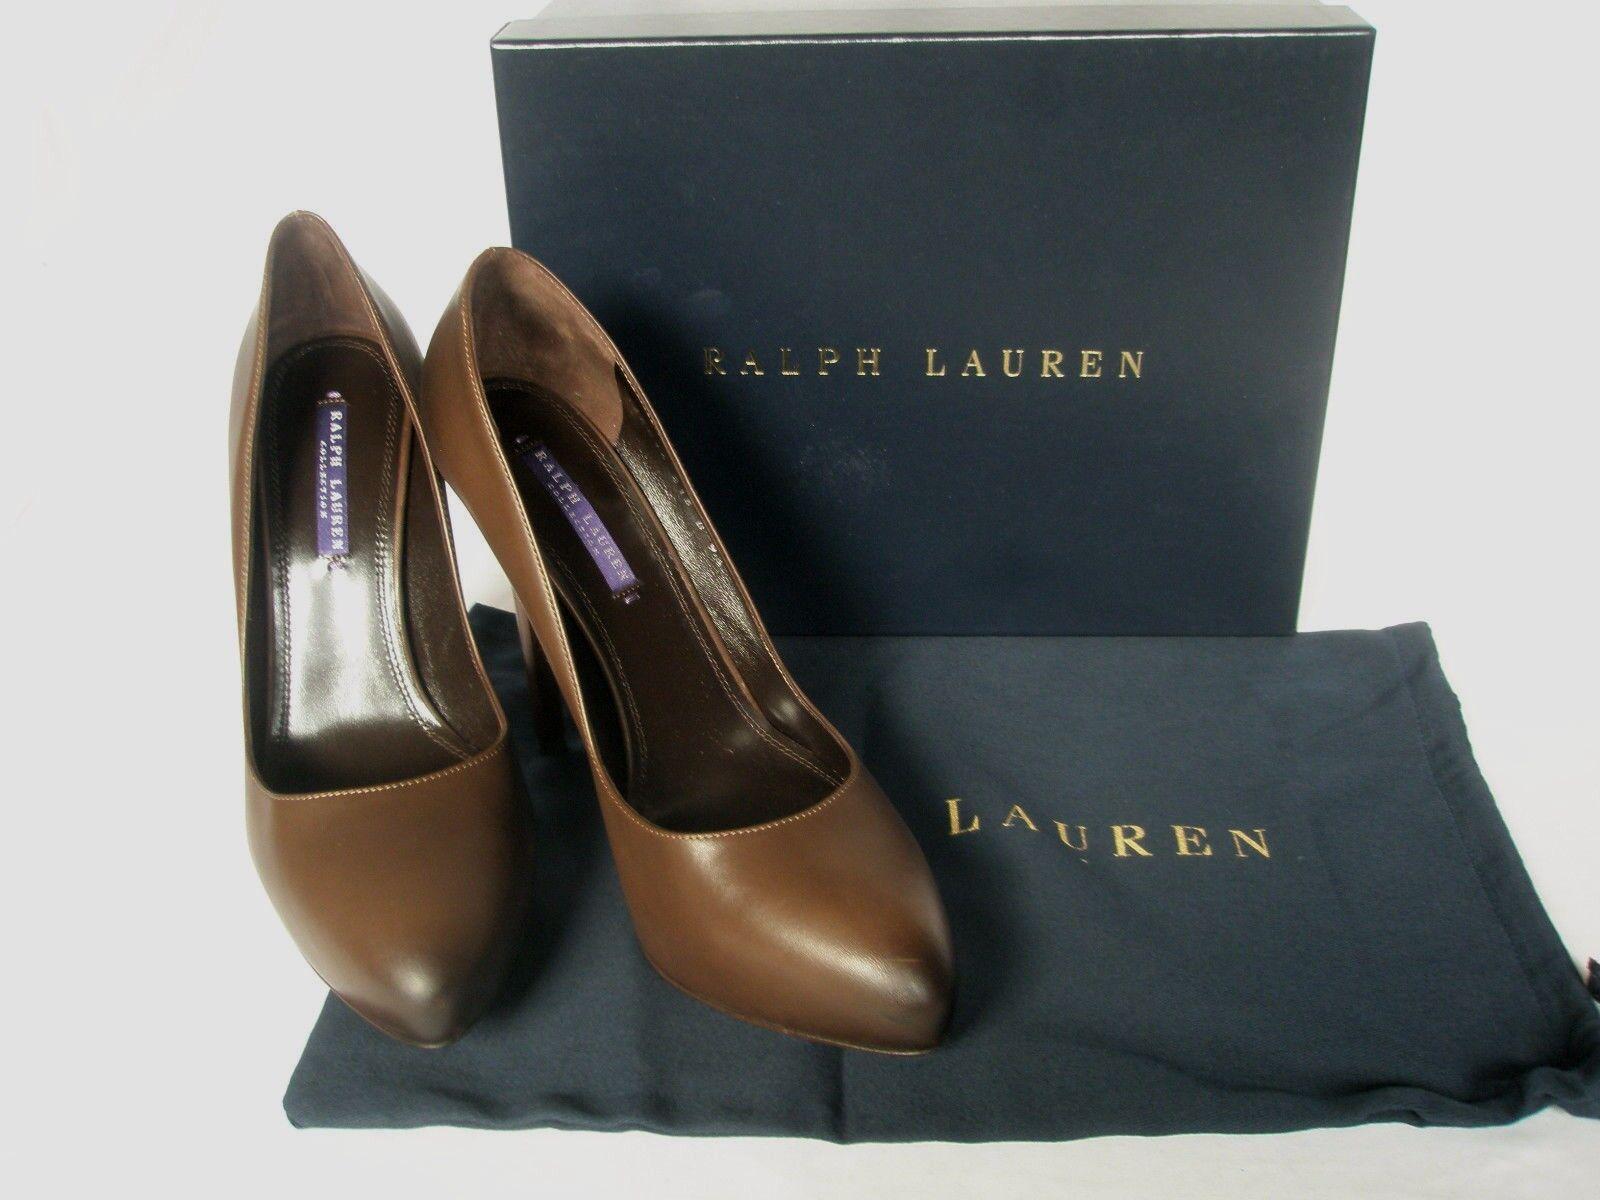 il più recente NUOVO Donna Ralph Lauren Lauren Lauren RA Benita Pelle Marrone. TG EU 37 US 7  acquista marca